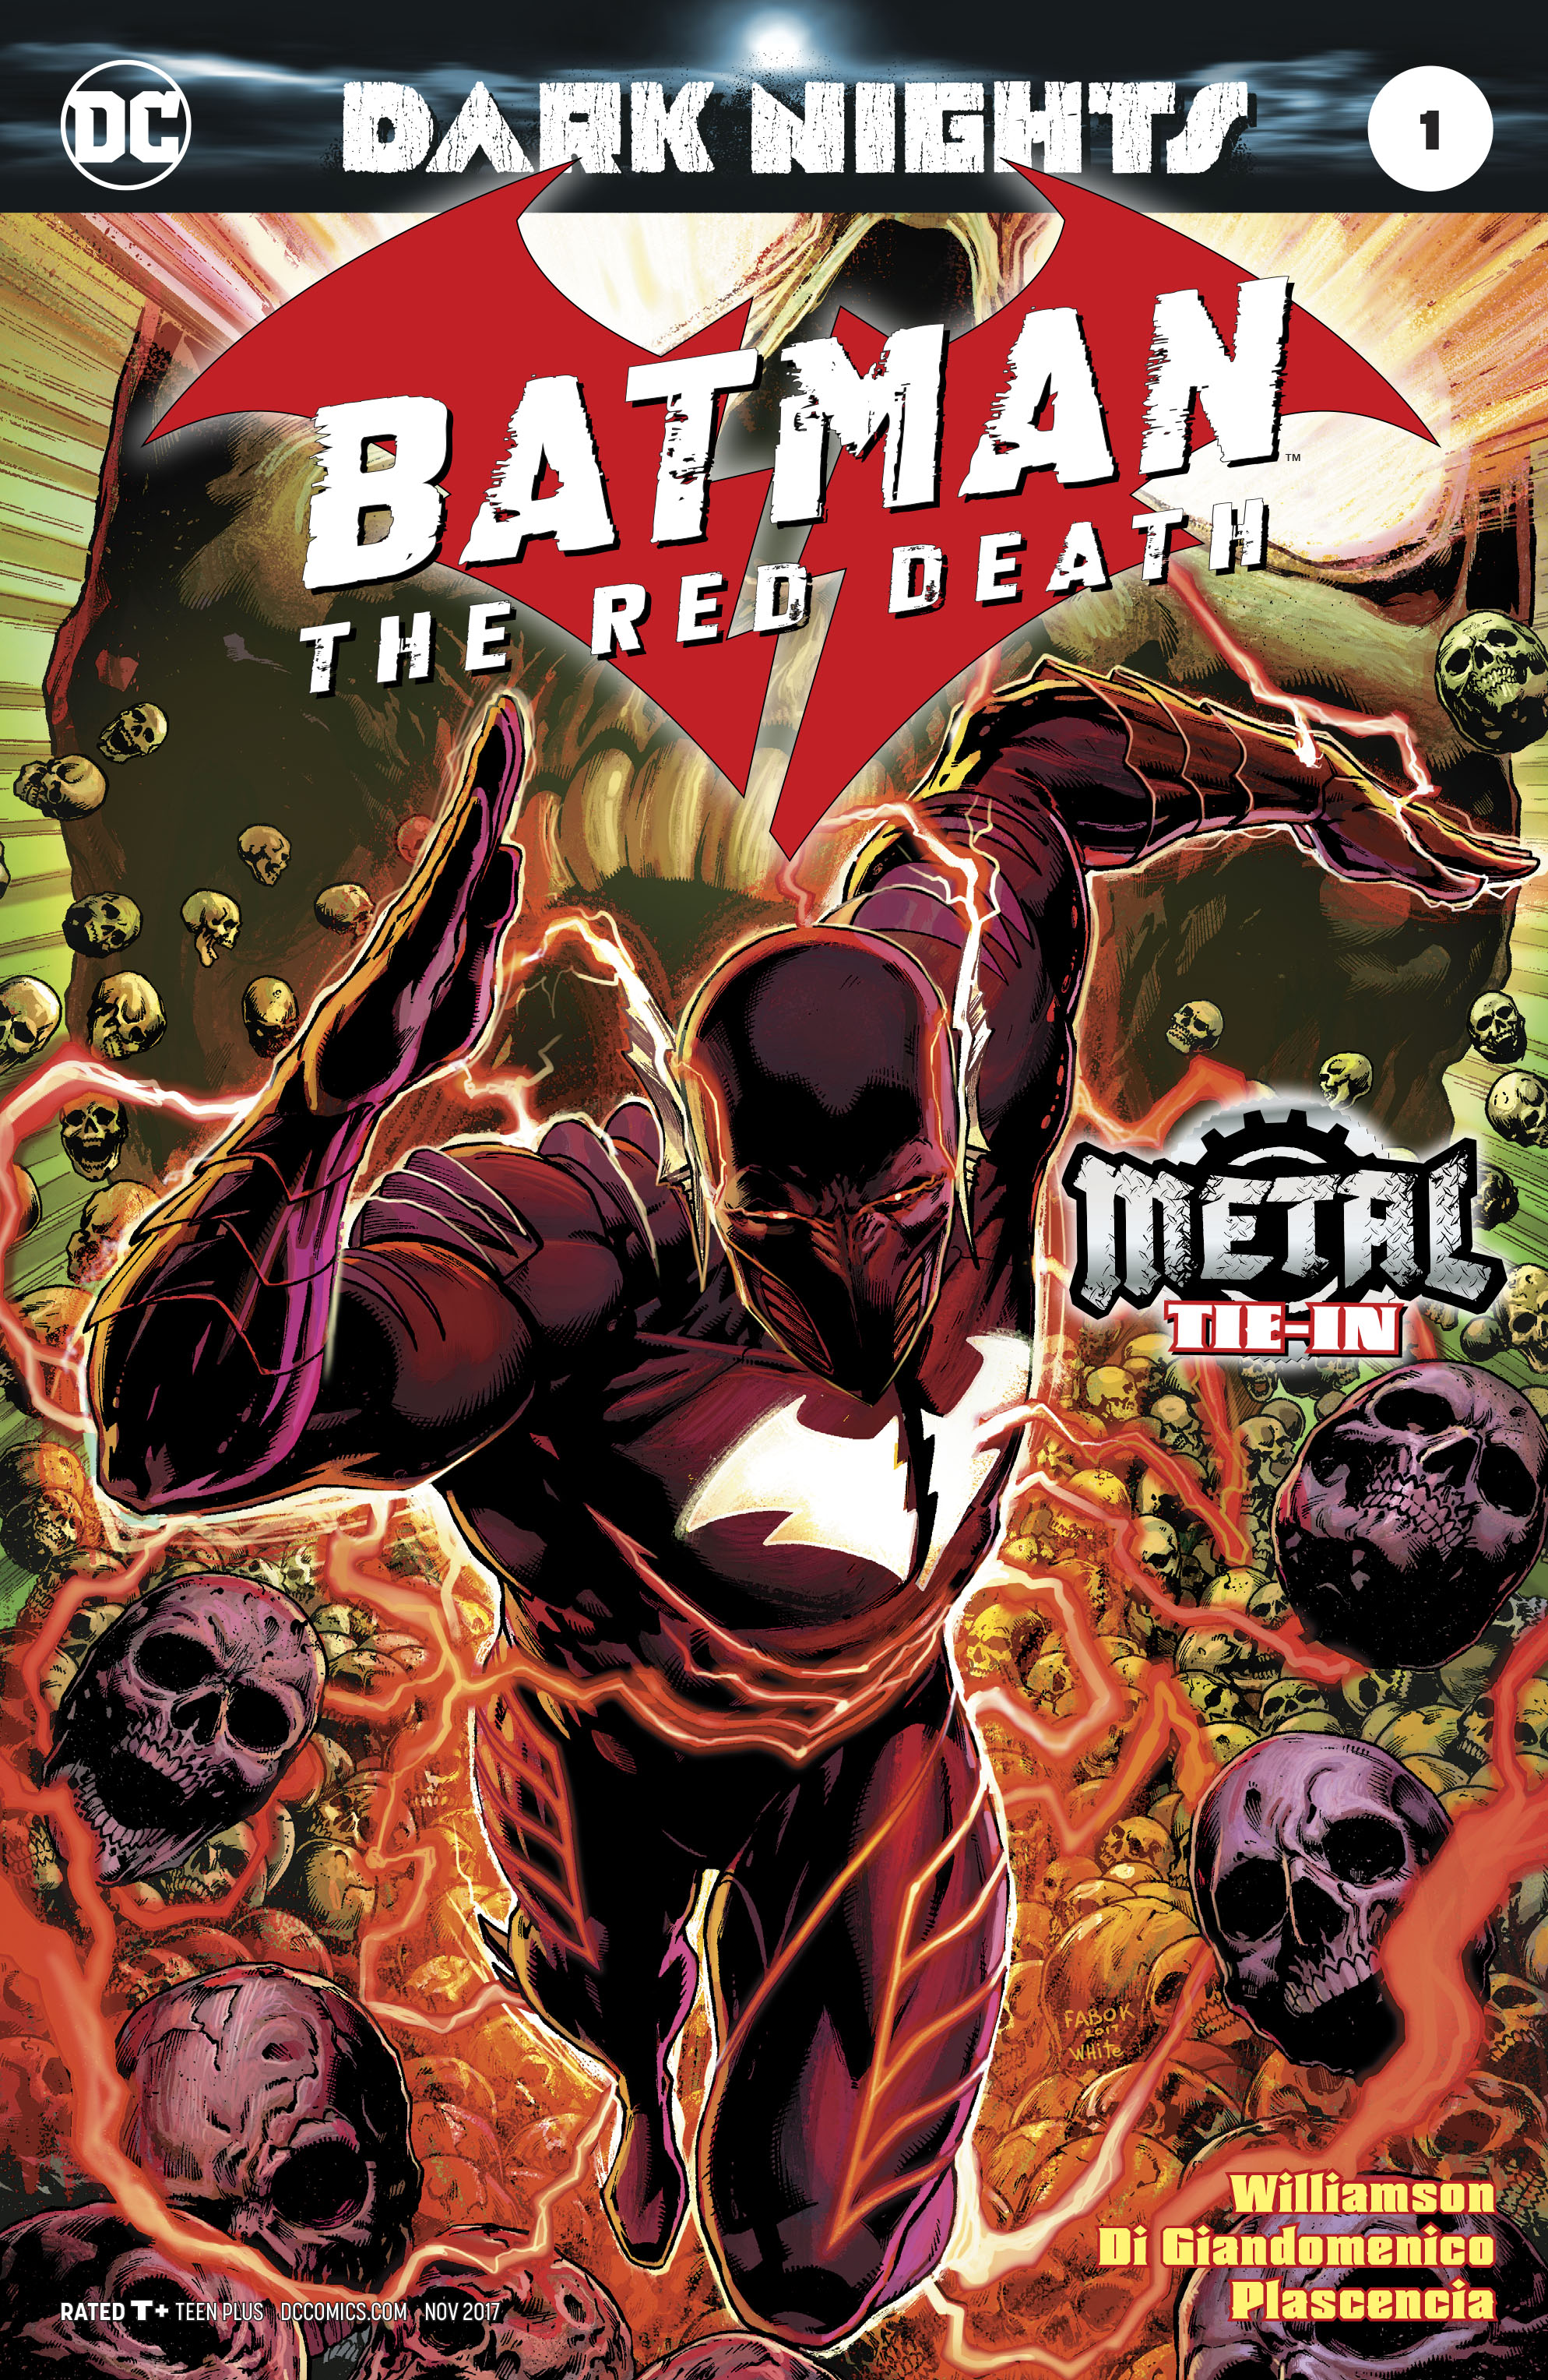 Batman The Red Death #1 Foil-Stamped Cover (Dark Nights Metal Tie-In)